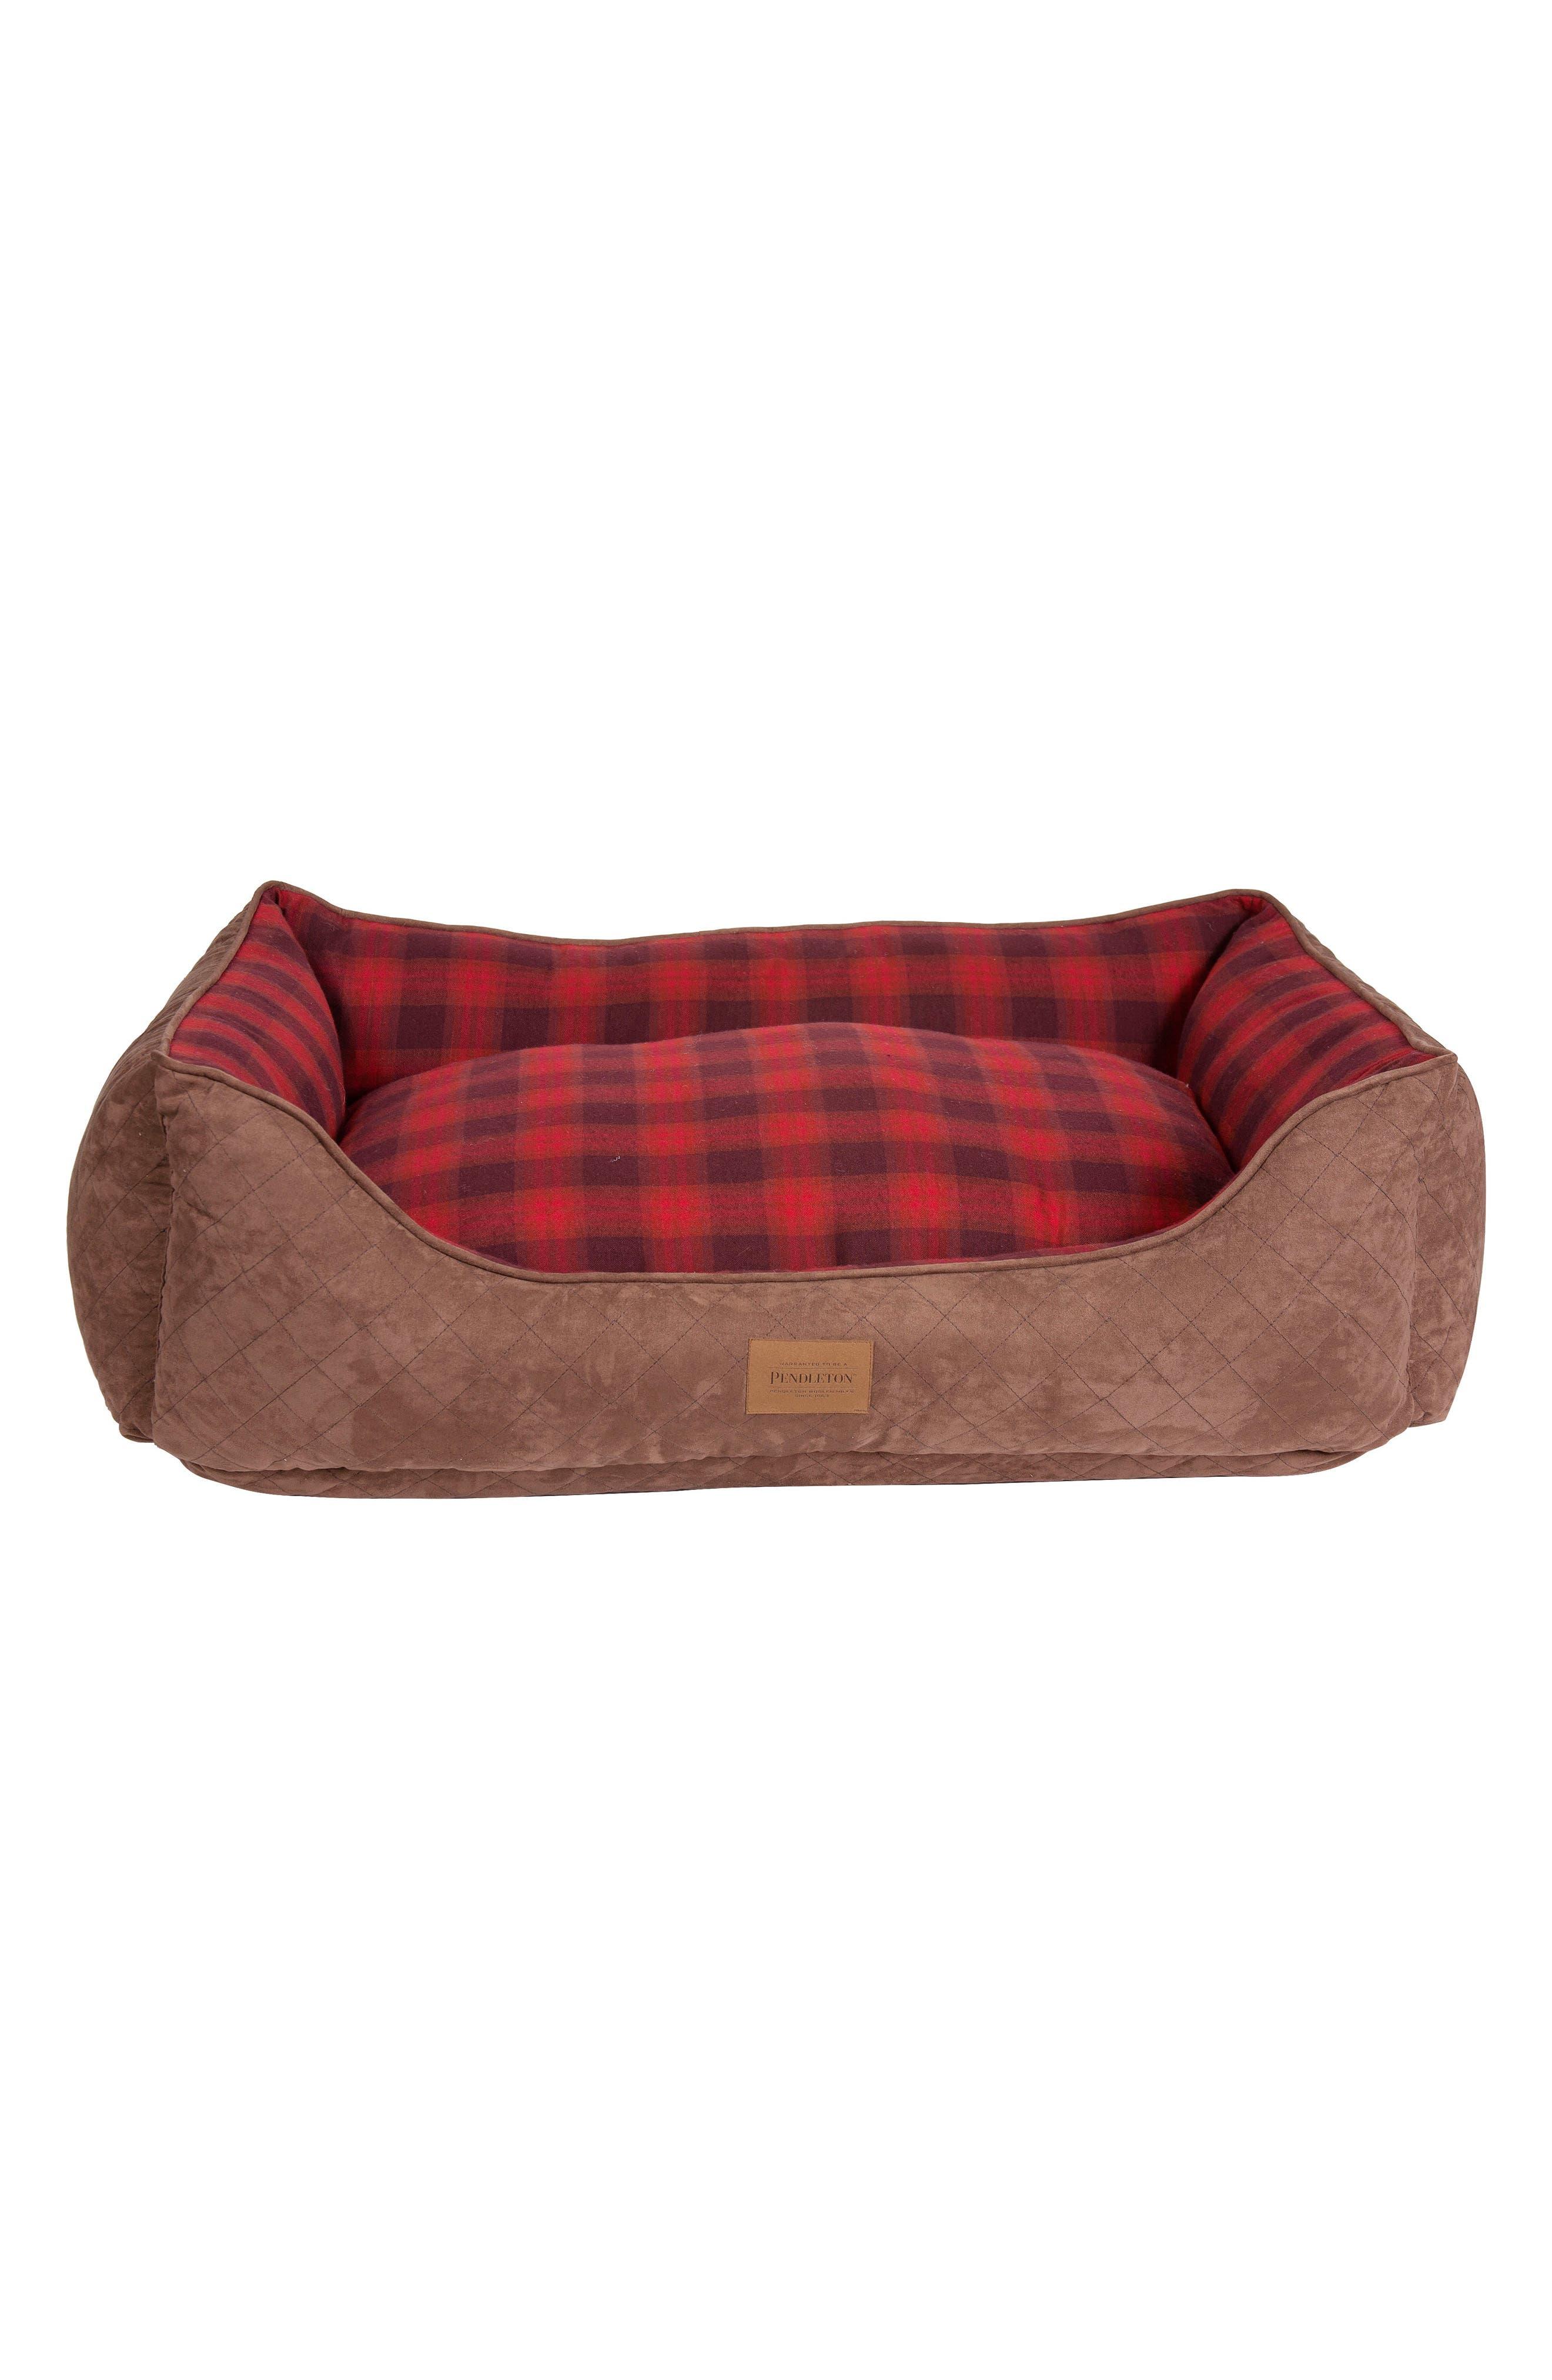 Carolina Pet Company x Pendleton Classics Kuddler Pet Bed